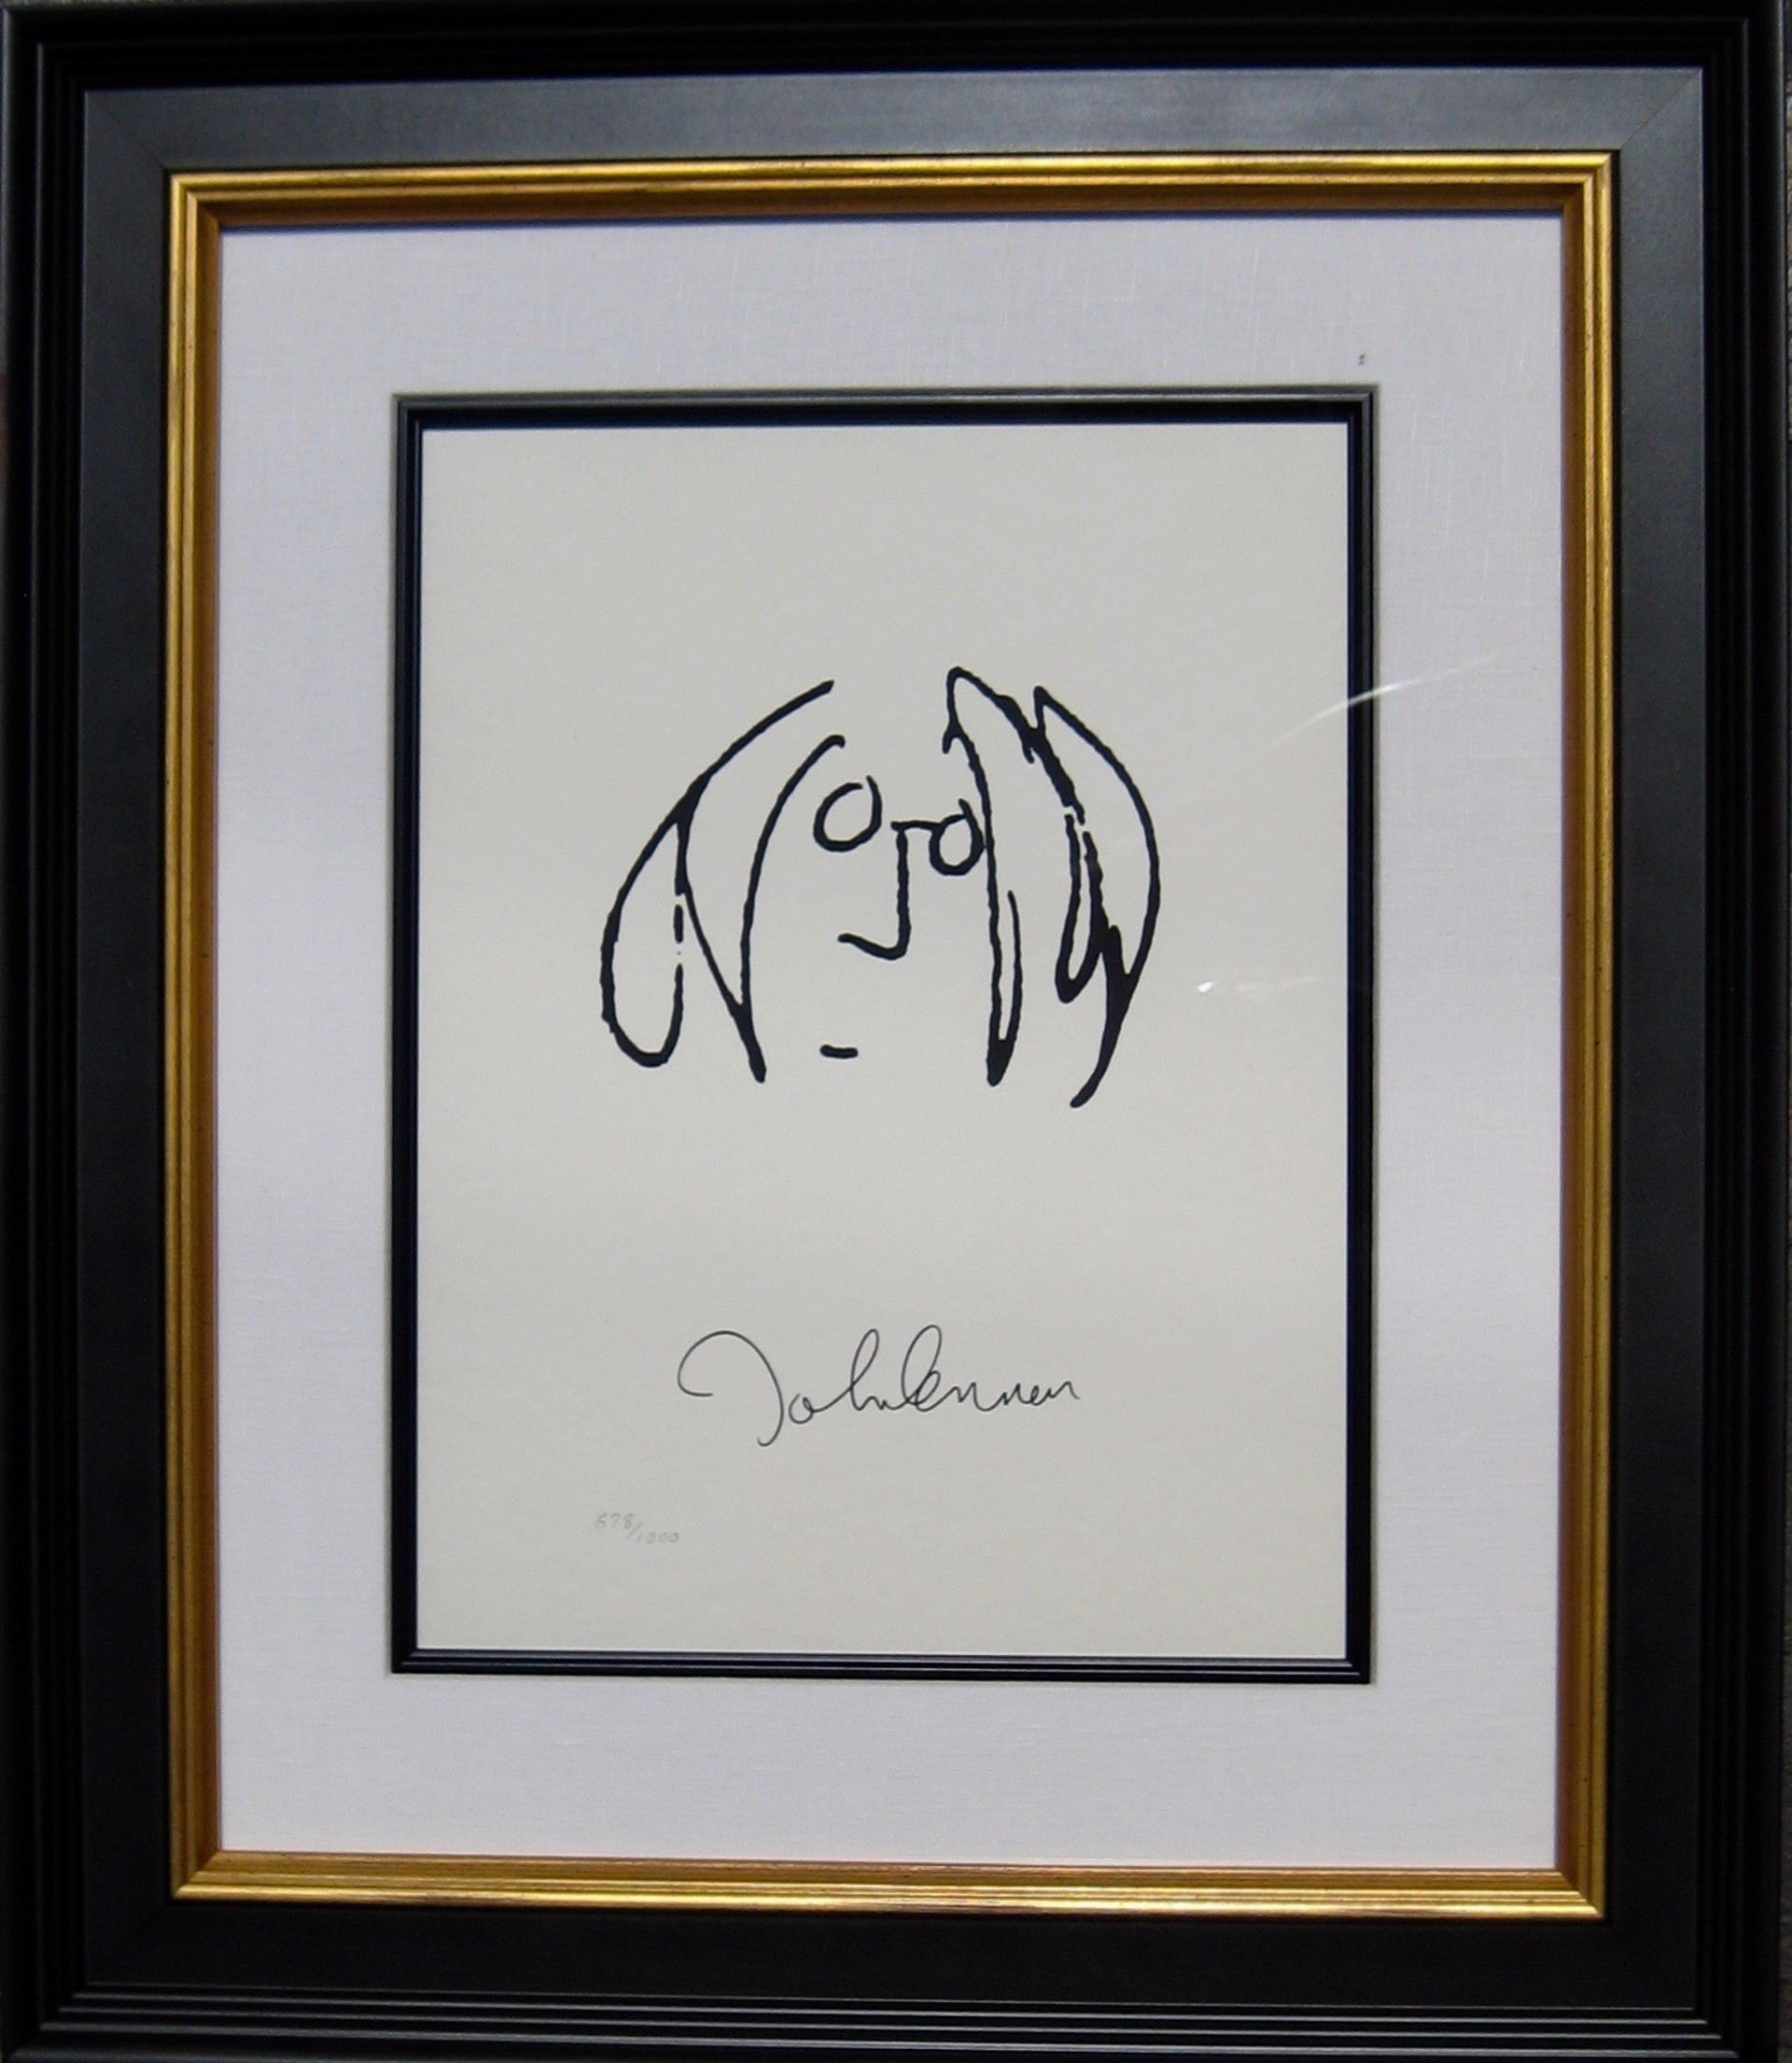 Lyric Self Portrait by John Lennon